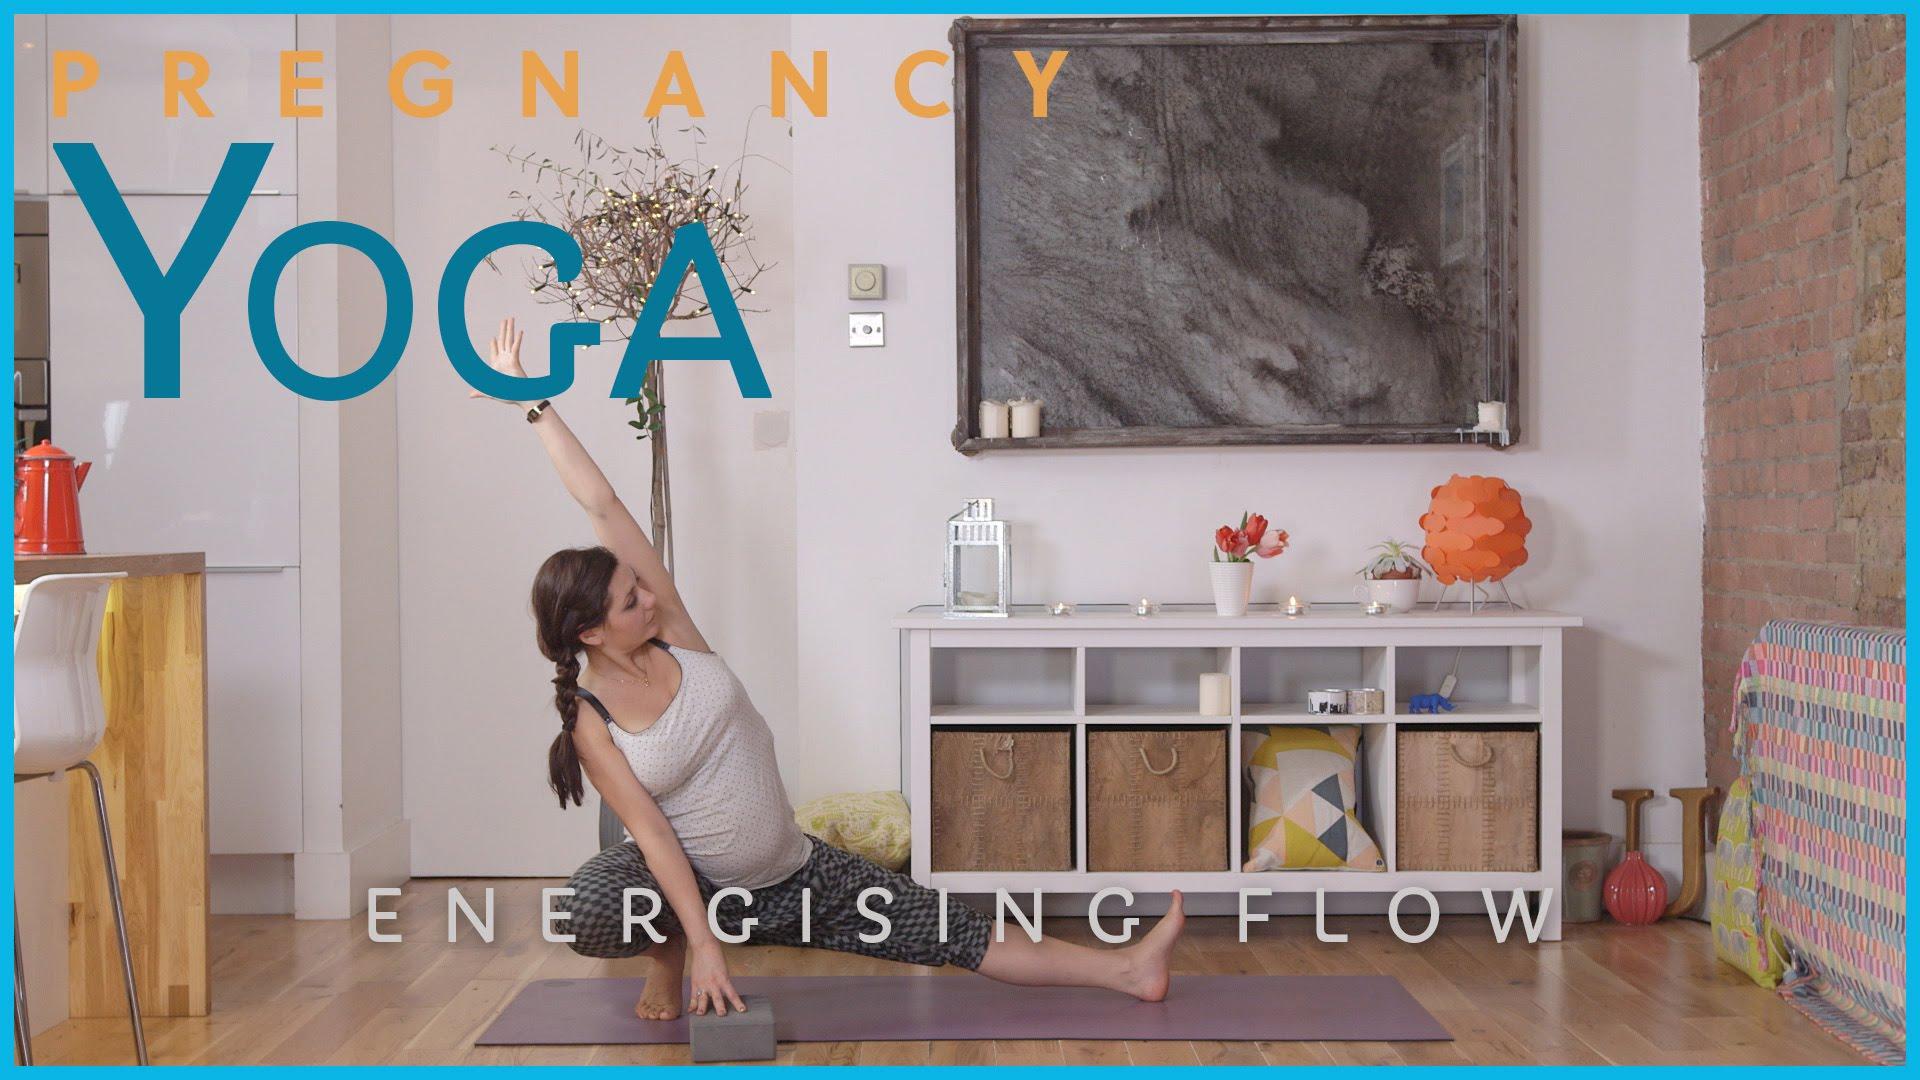 Pregnancy Yoga – Energising Flow